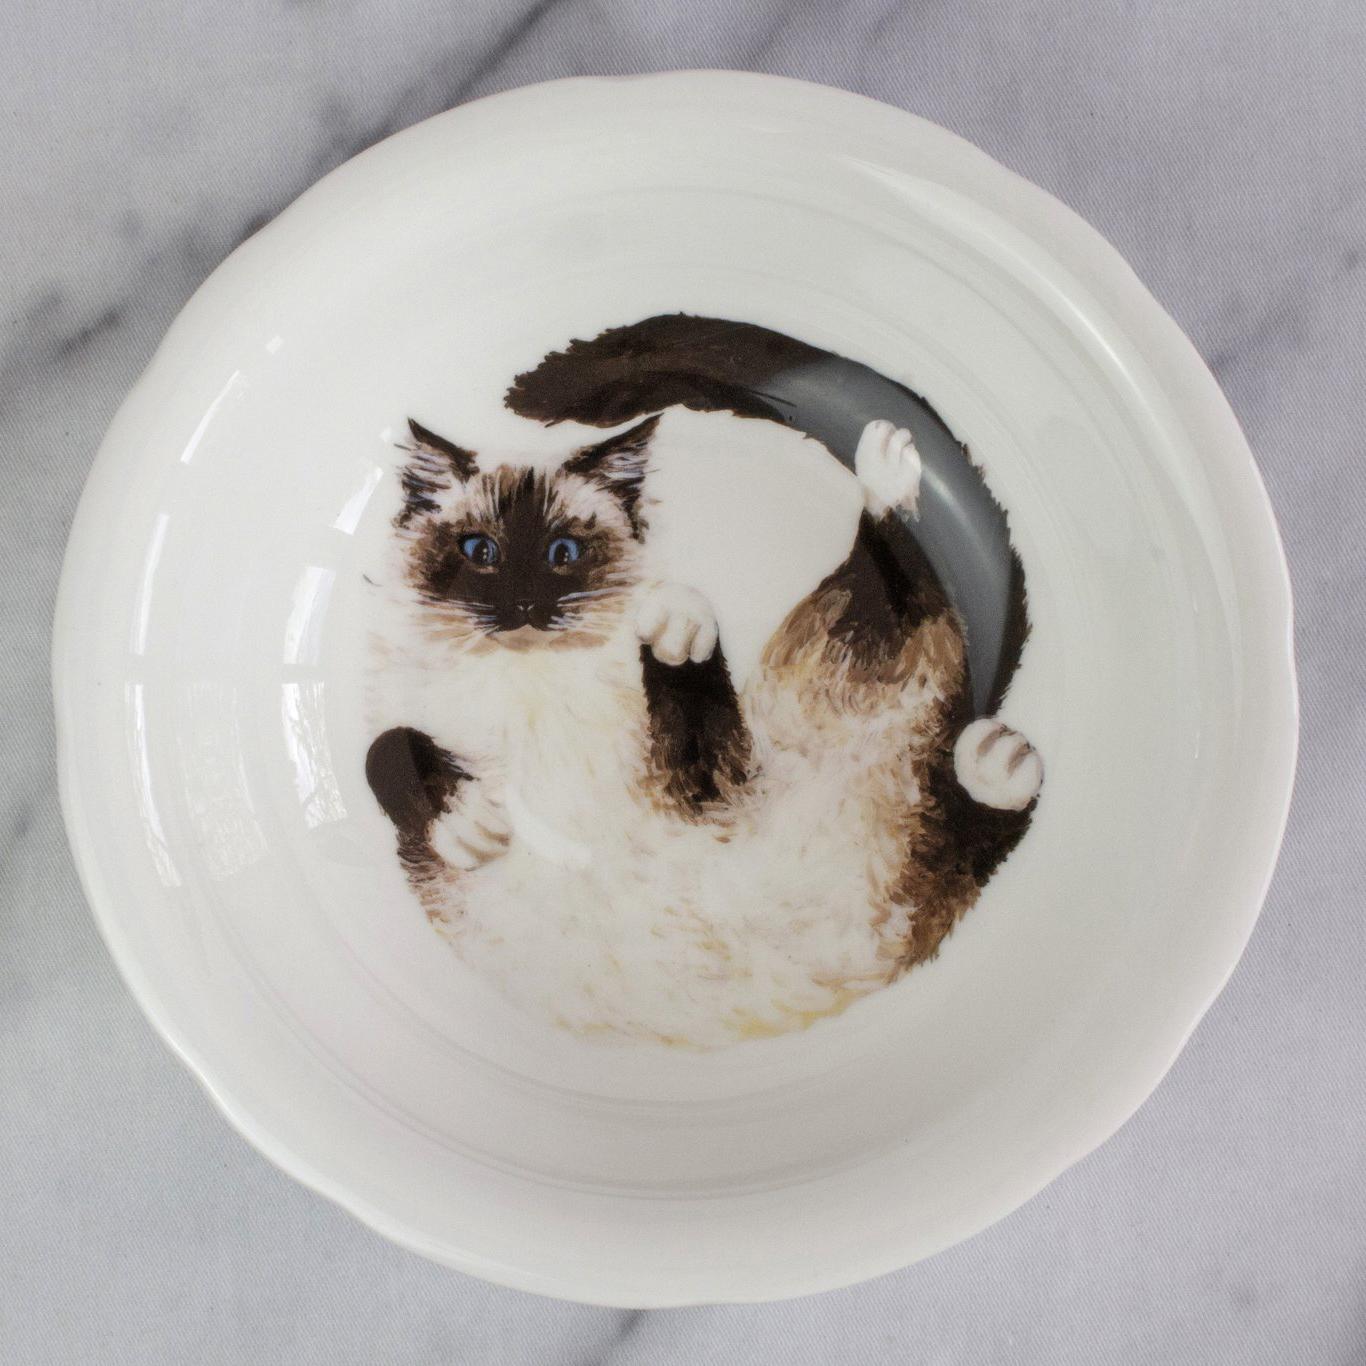 Catnap_servingbowl_shoppingwithsoul.jpg